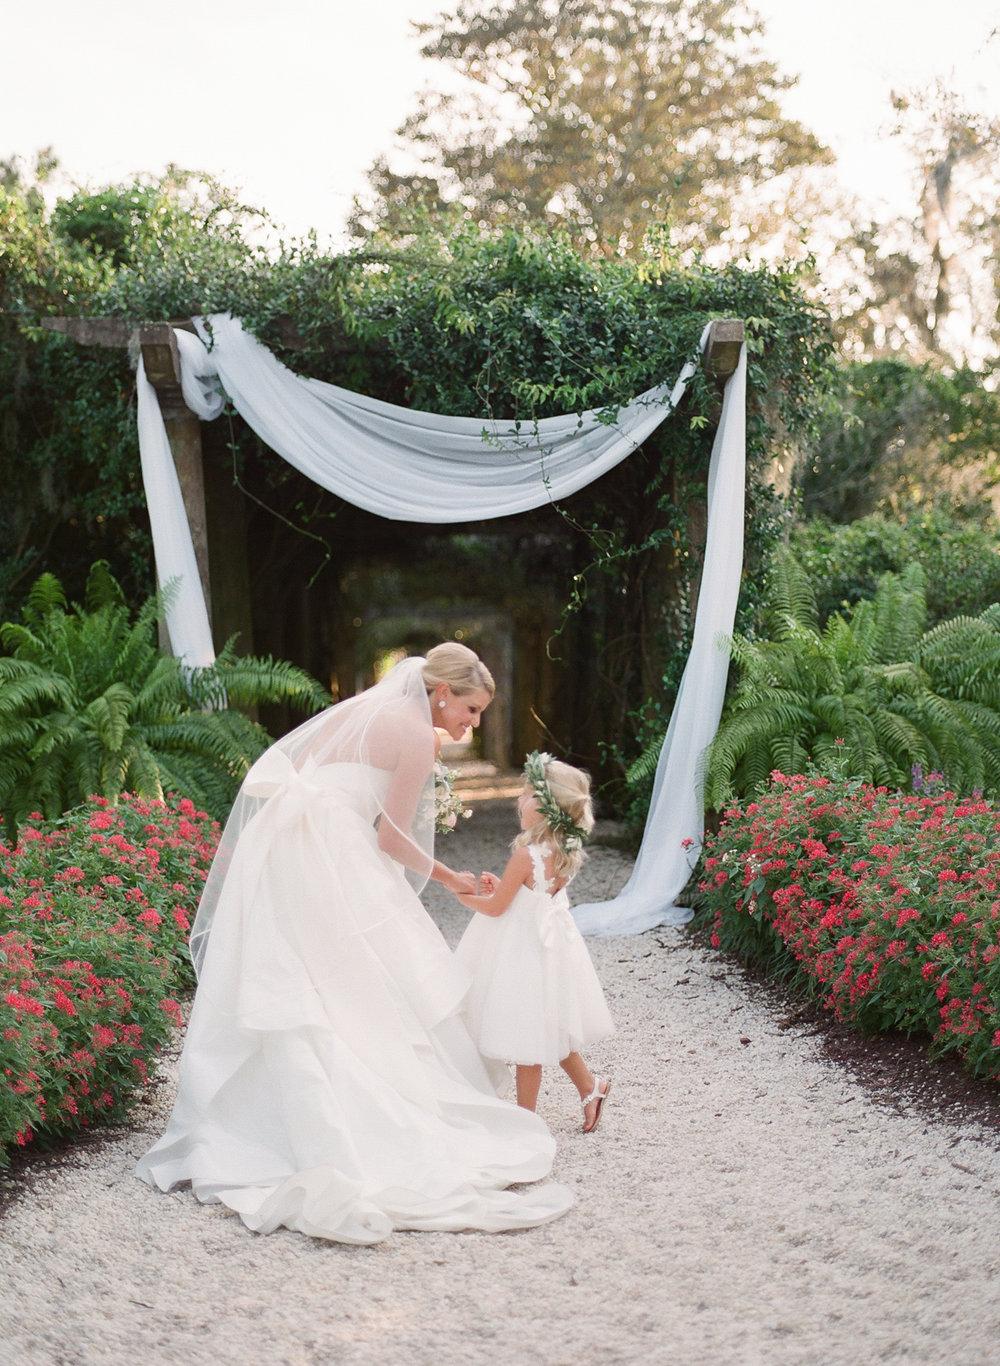 Airlie-Gardens-Wedding-44.jpg